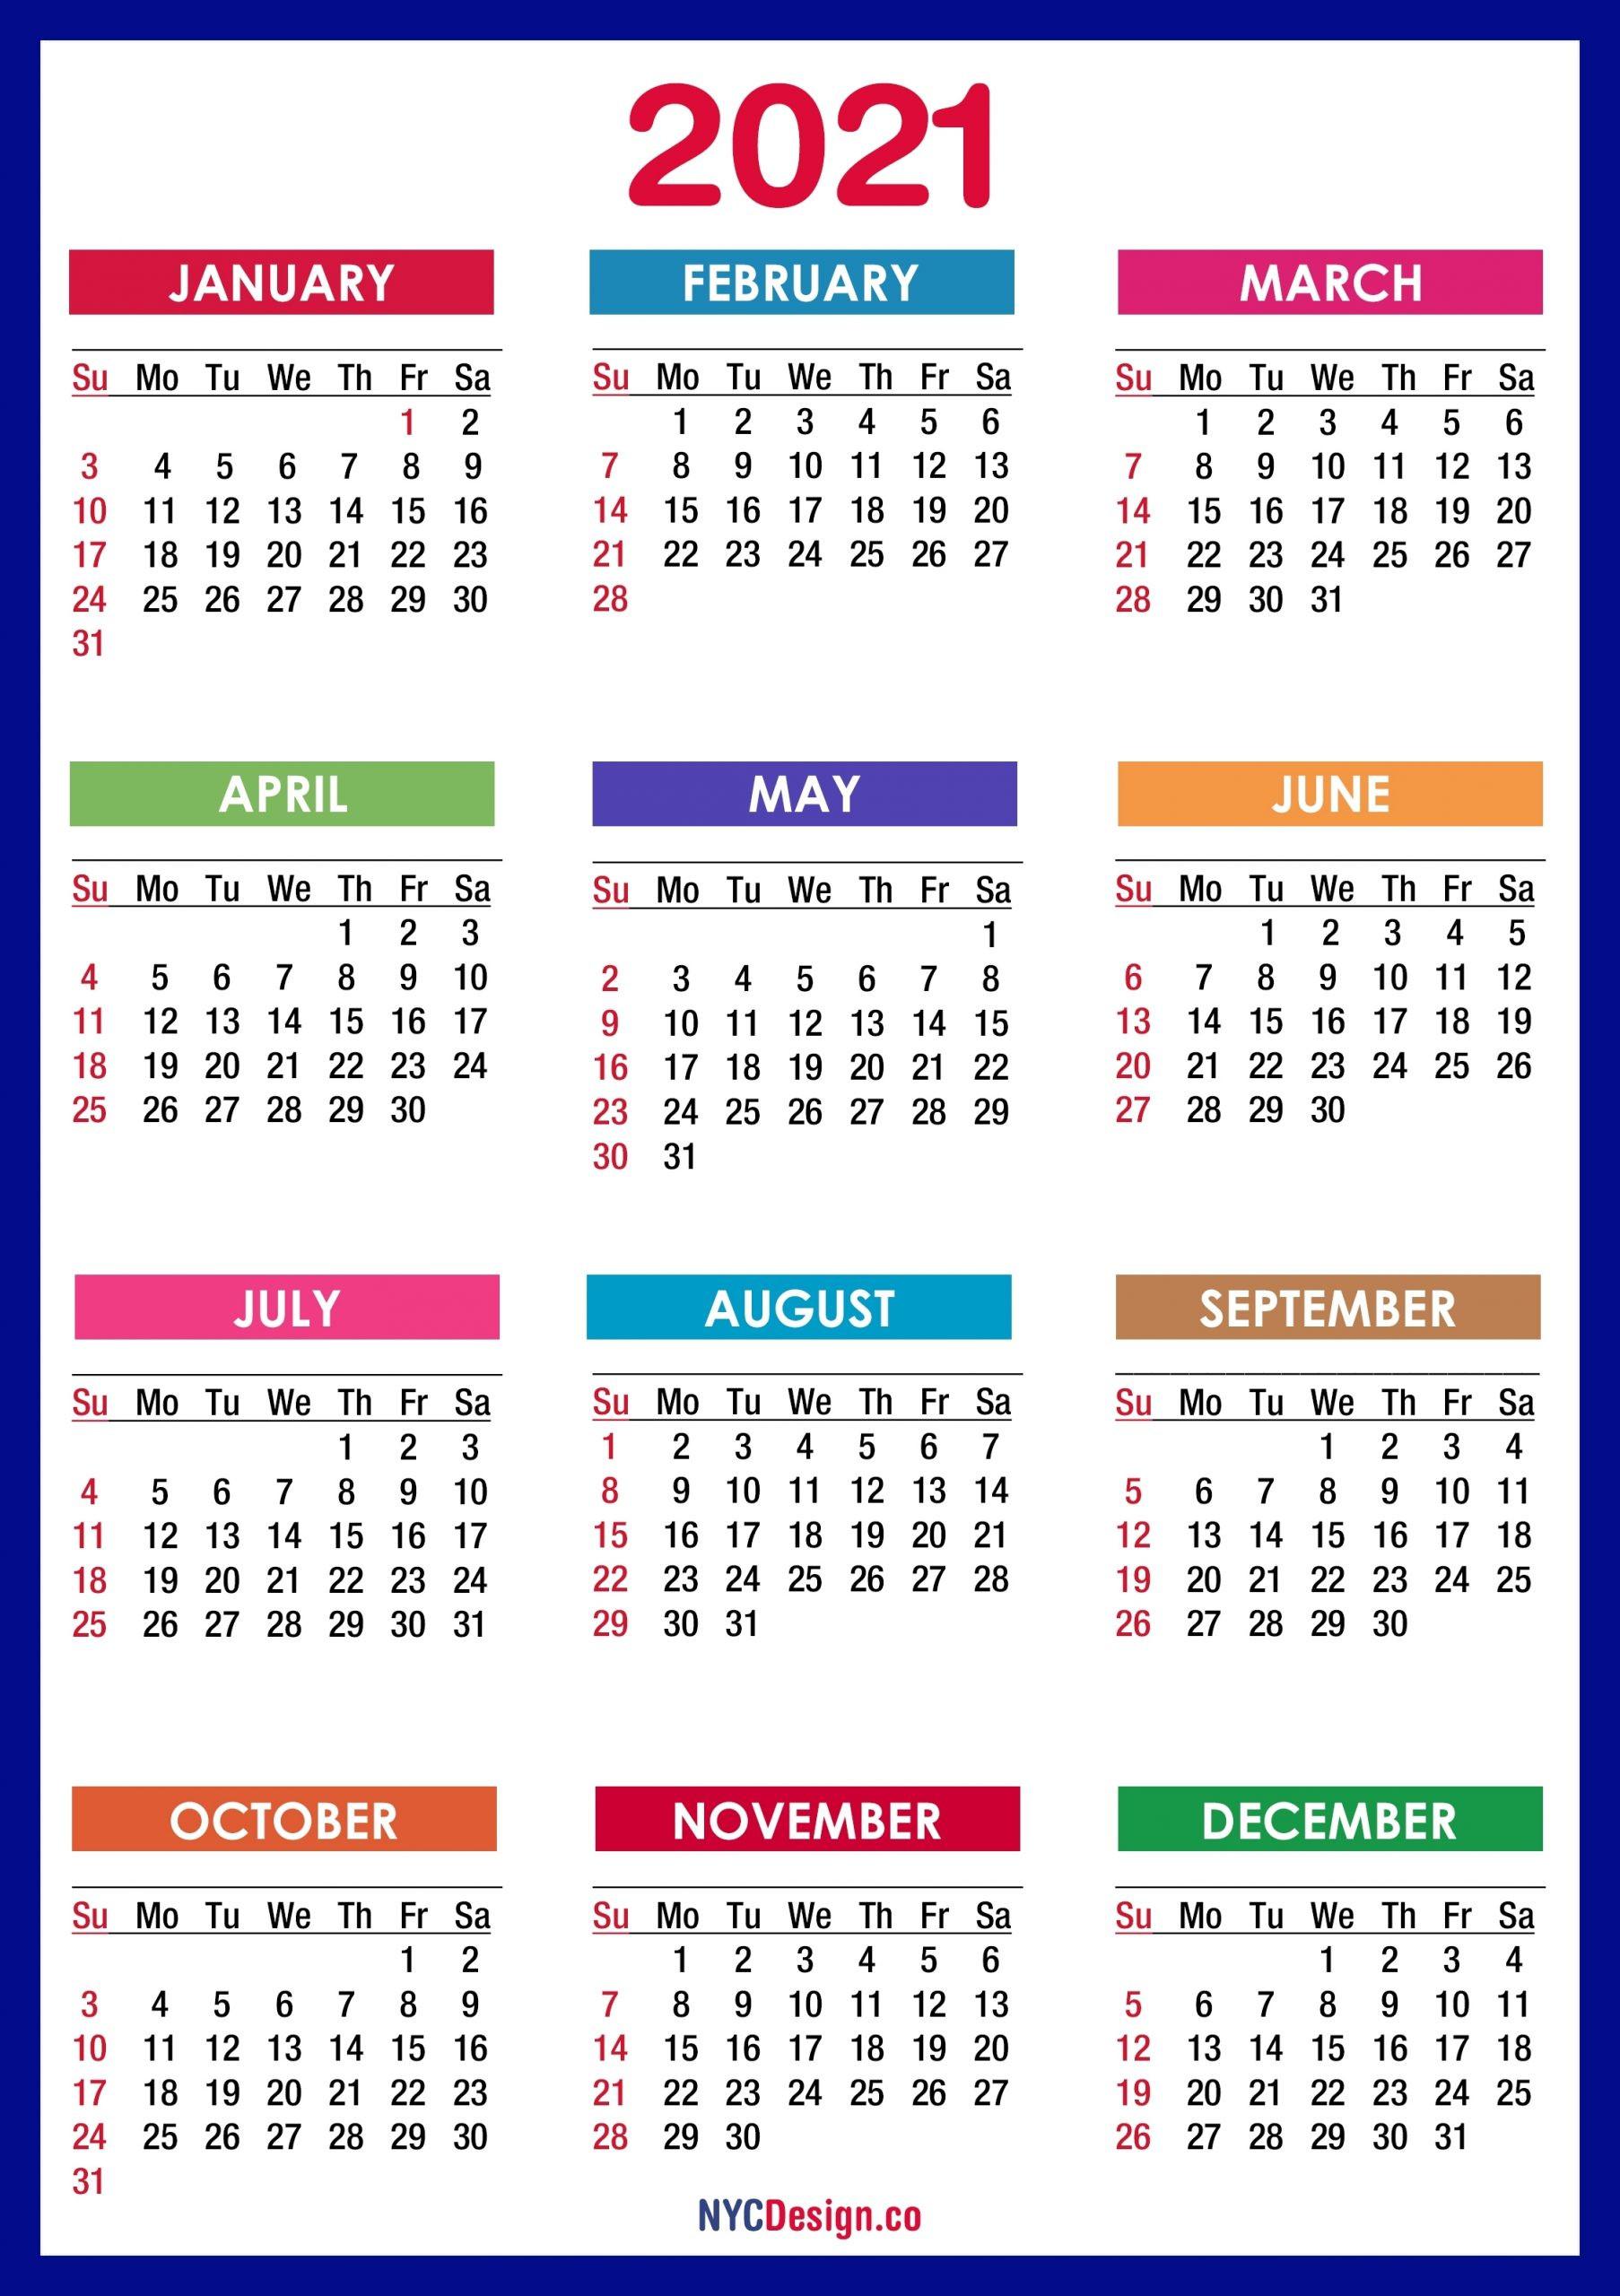 Monday Through Sunday Calendar 2021 - Template Calendar Design